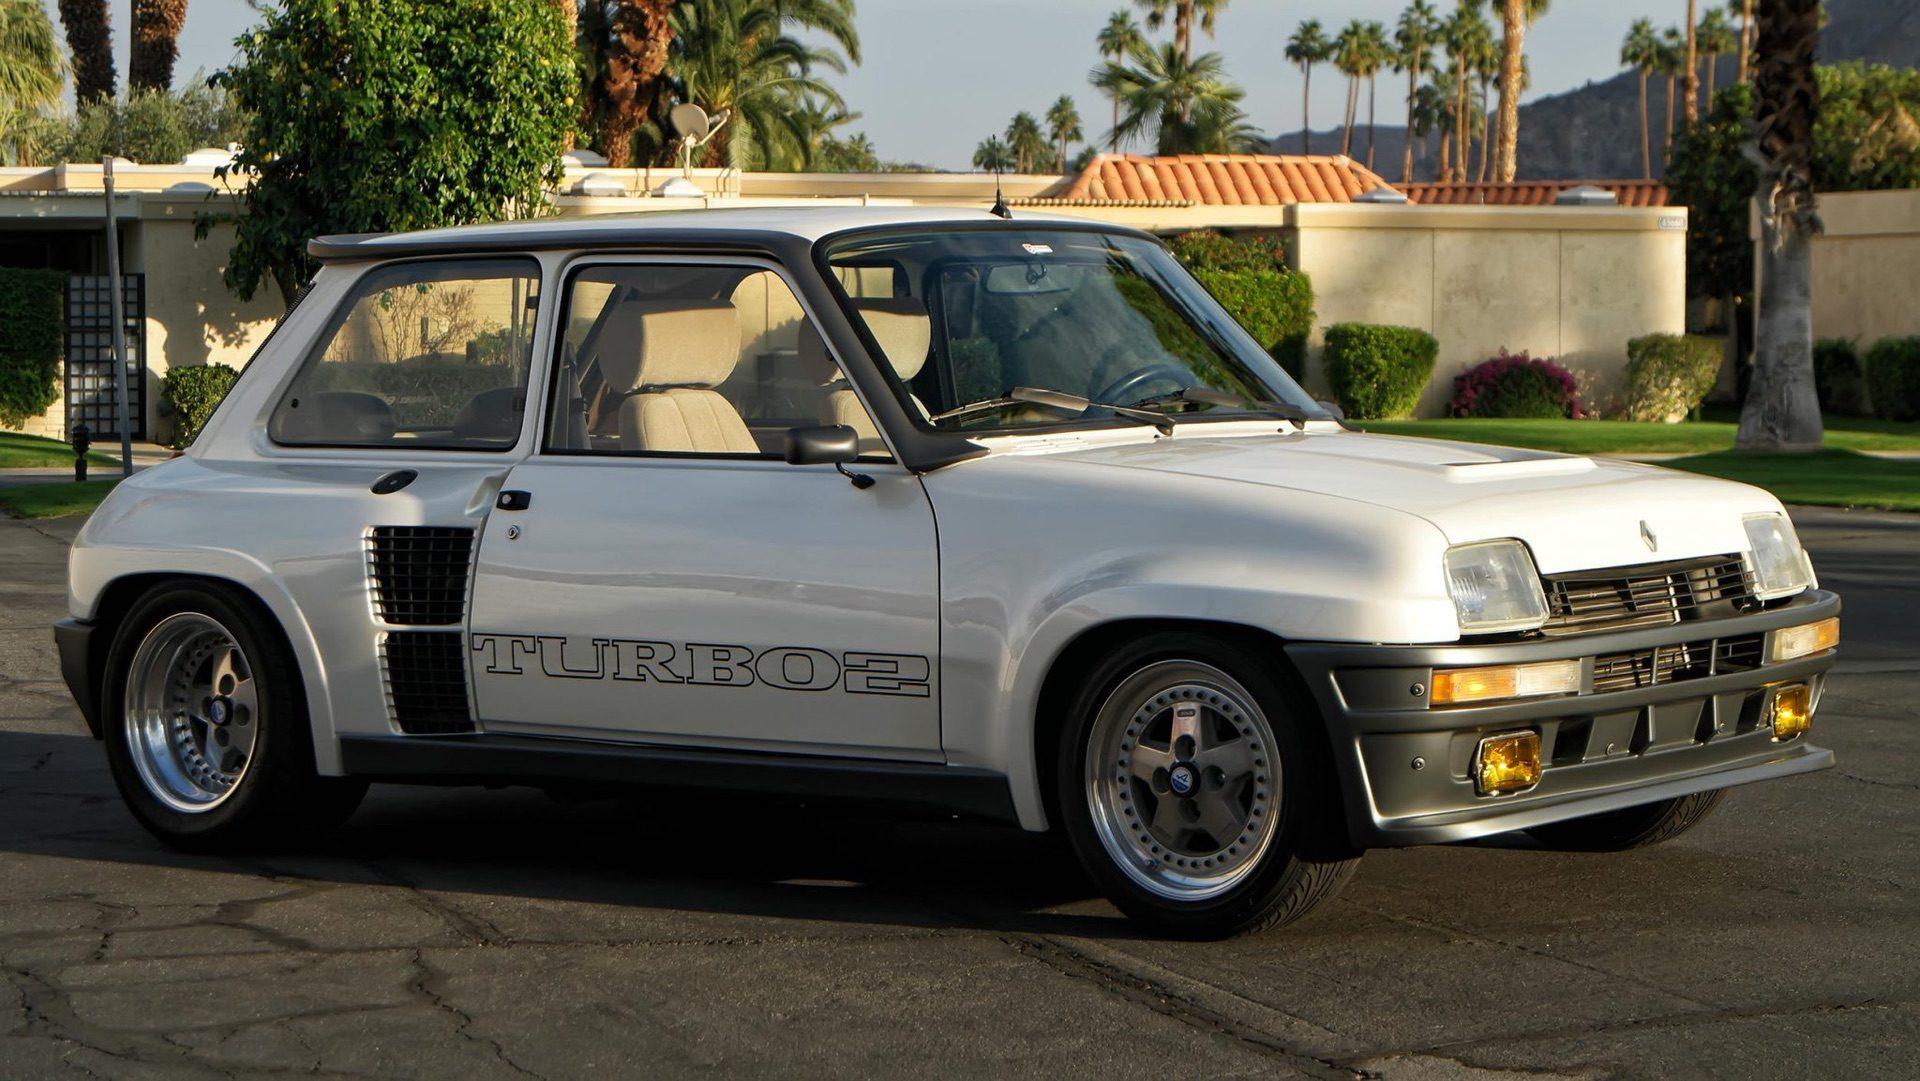 1985_Renault_R5_Turbo_2_rotary-0008